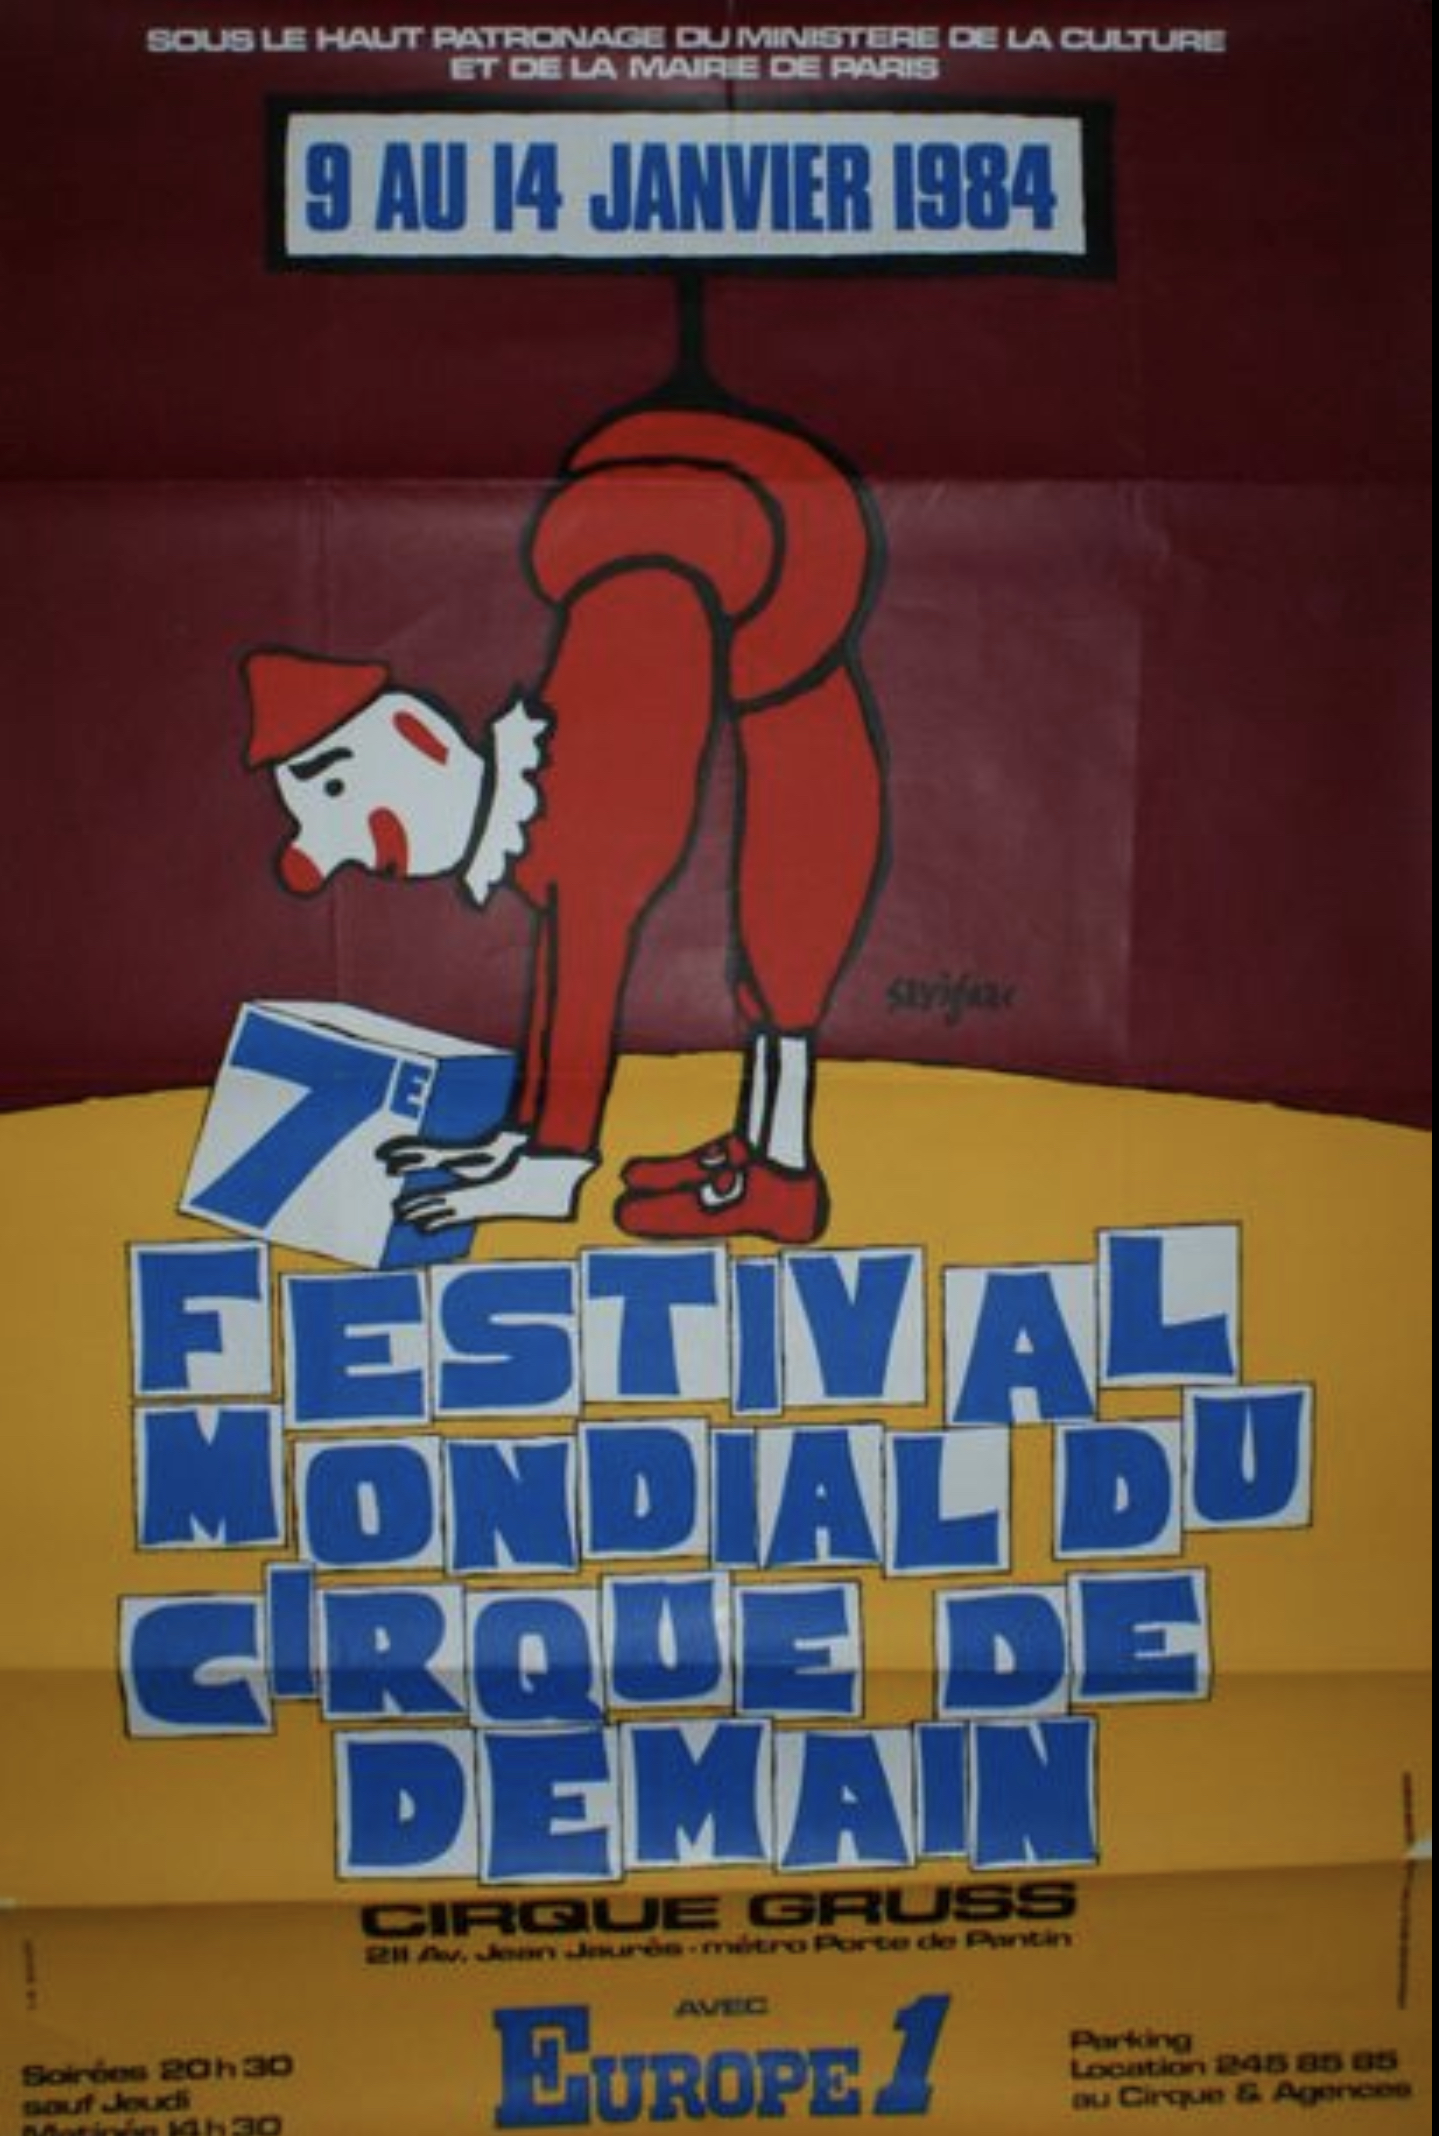 Savignac Festival Mondial du Cirque de Demain Original Vintage Poster